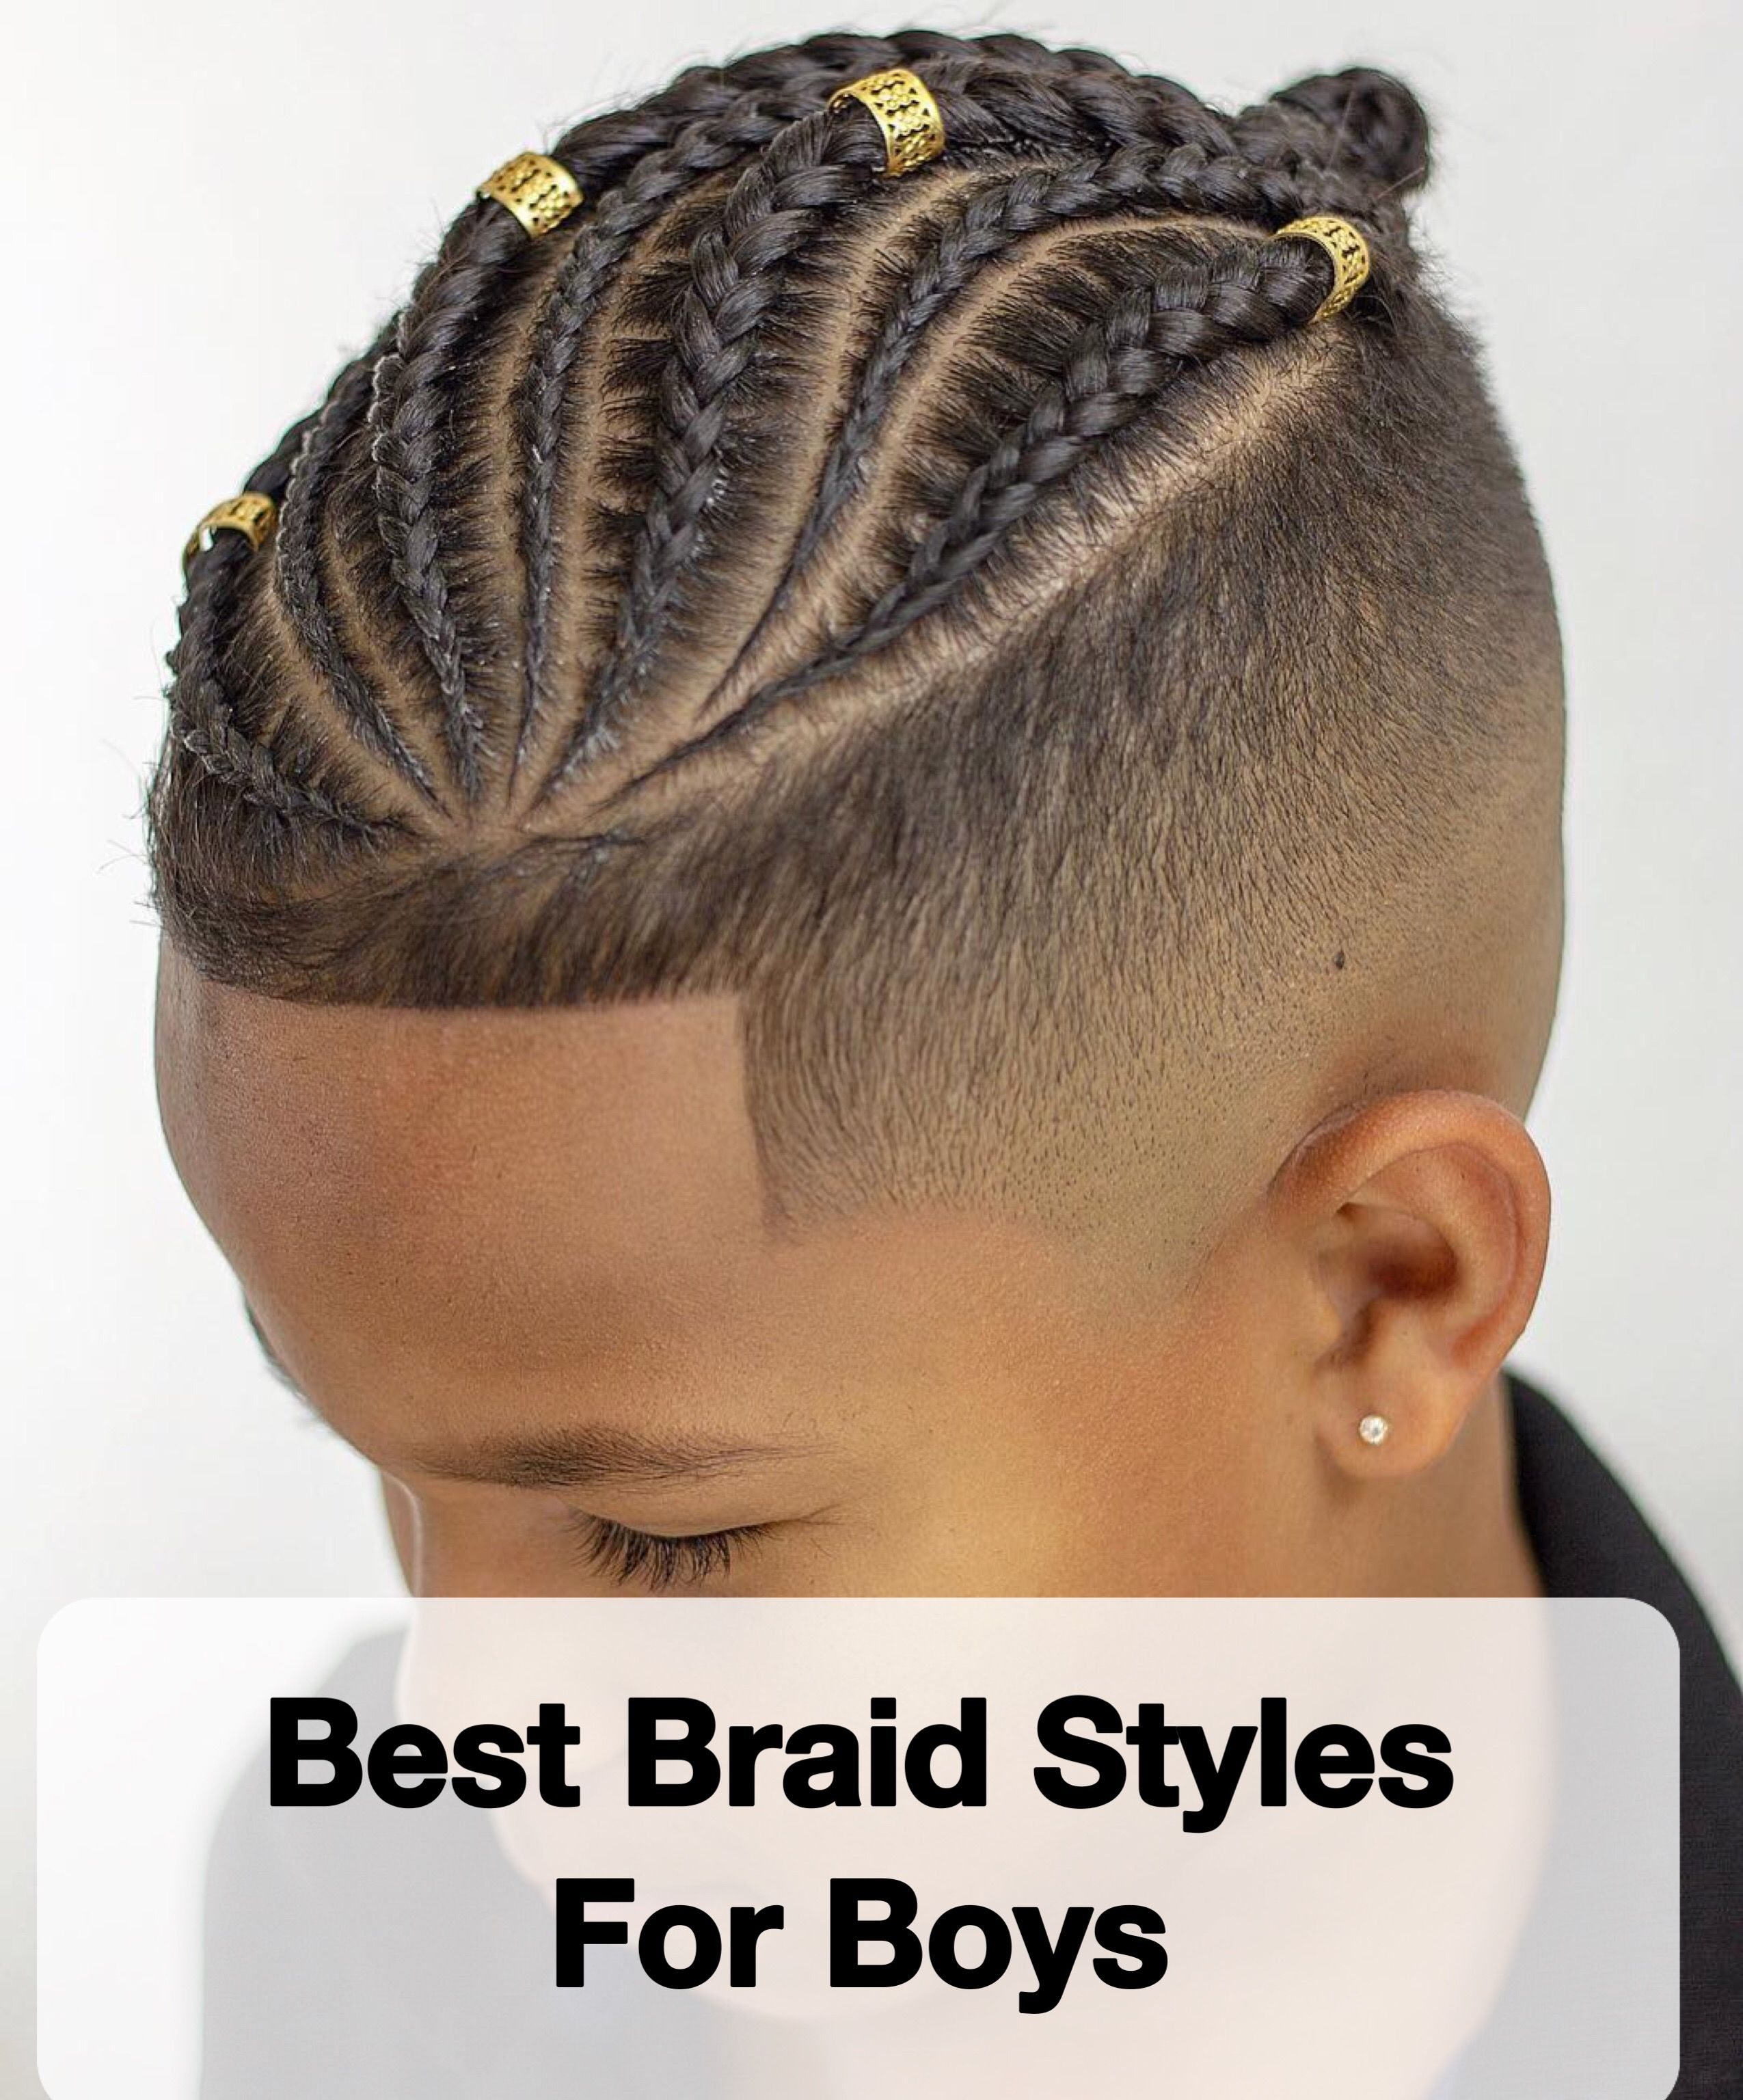 braids for kids: 15 amazing braid styles for boys | braids